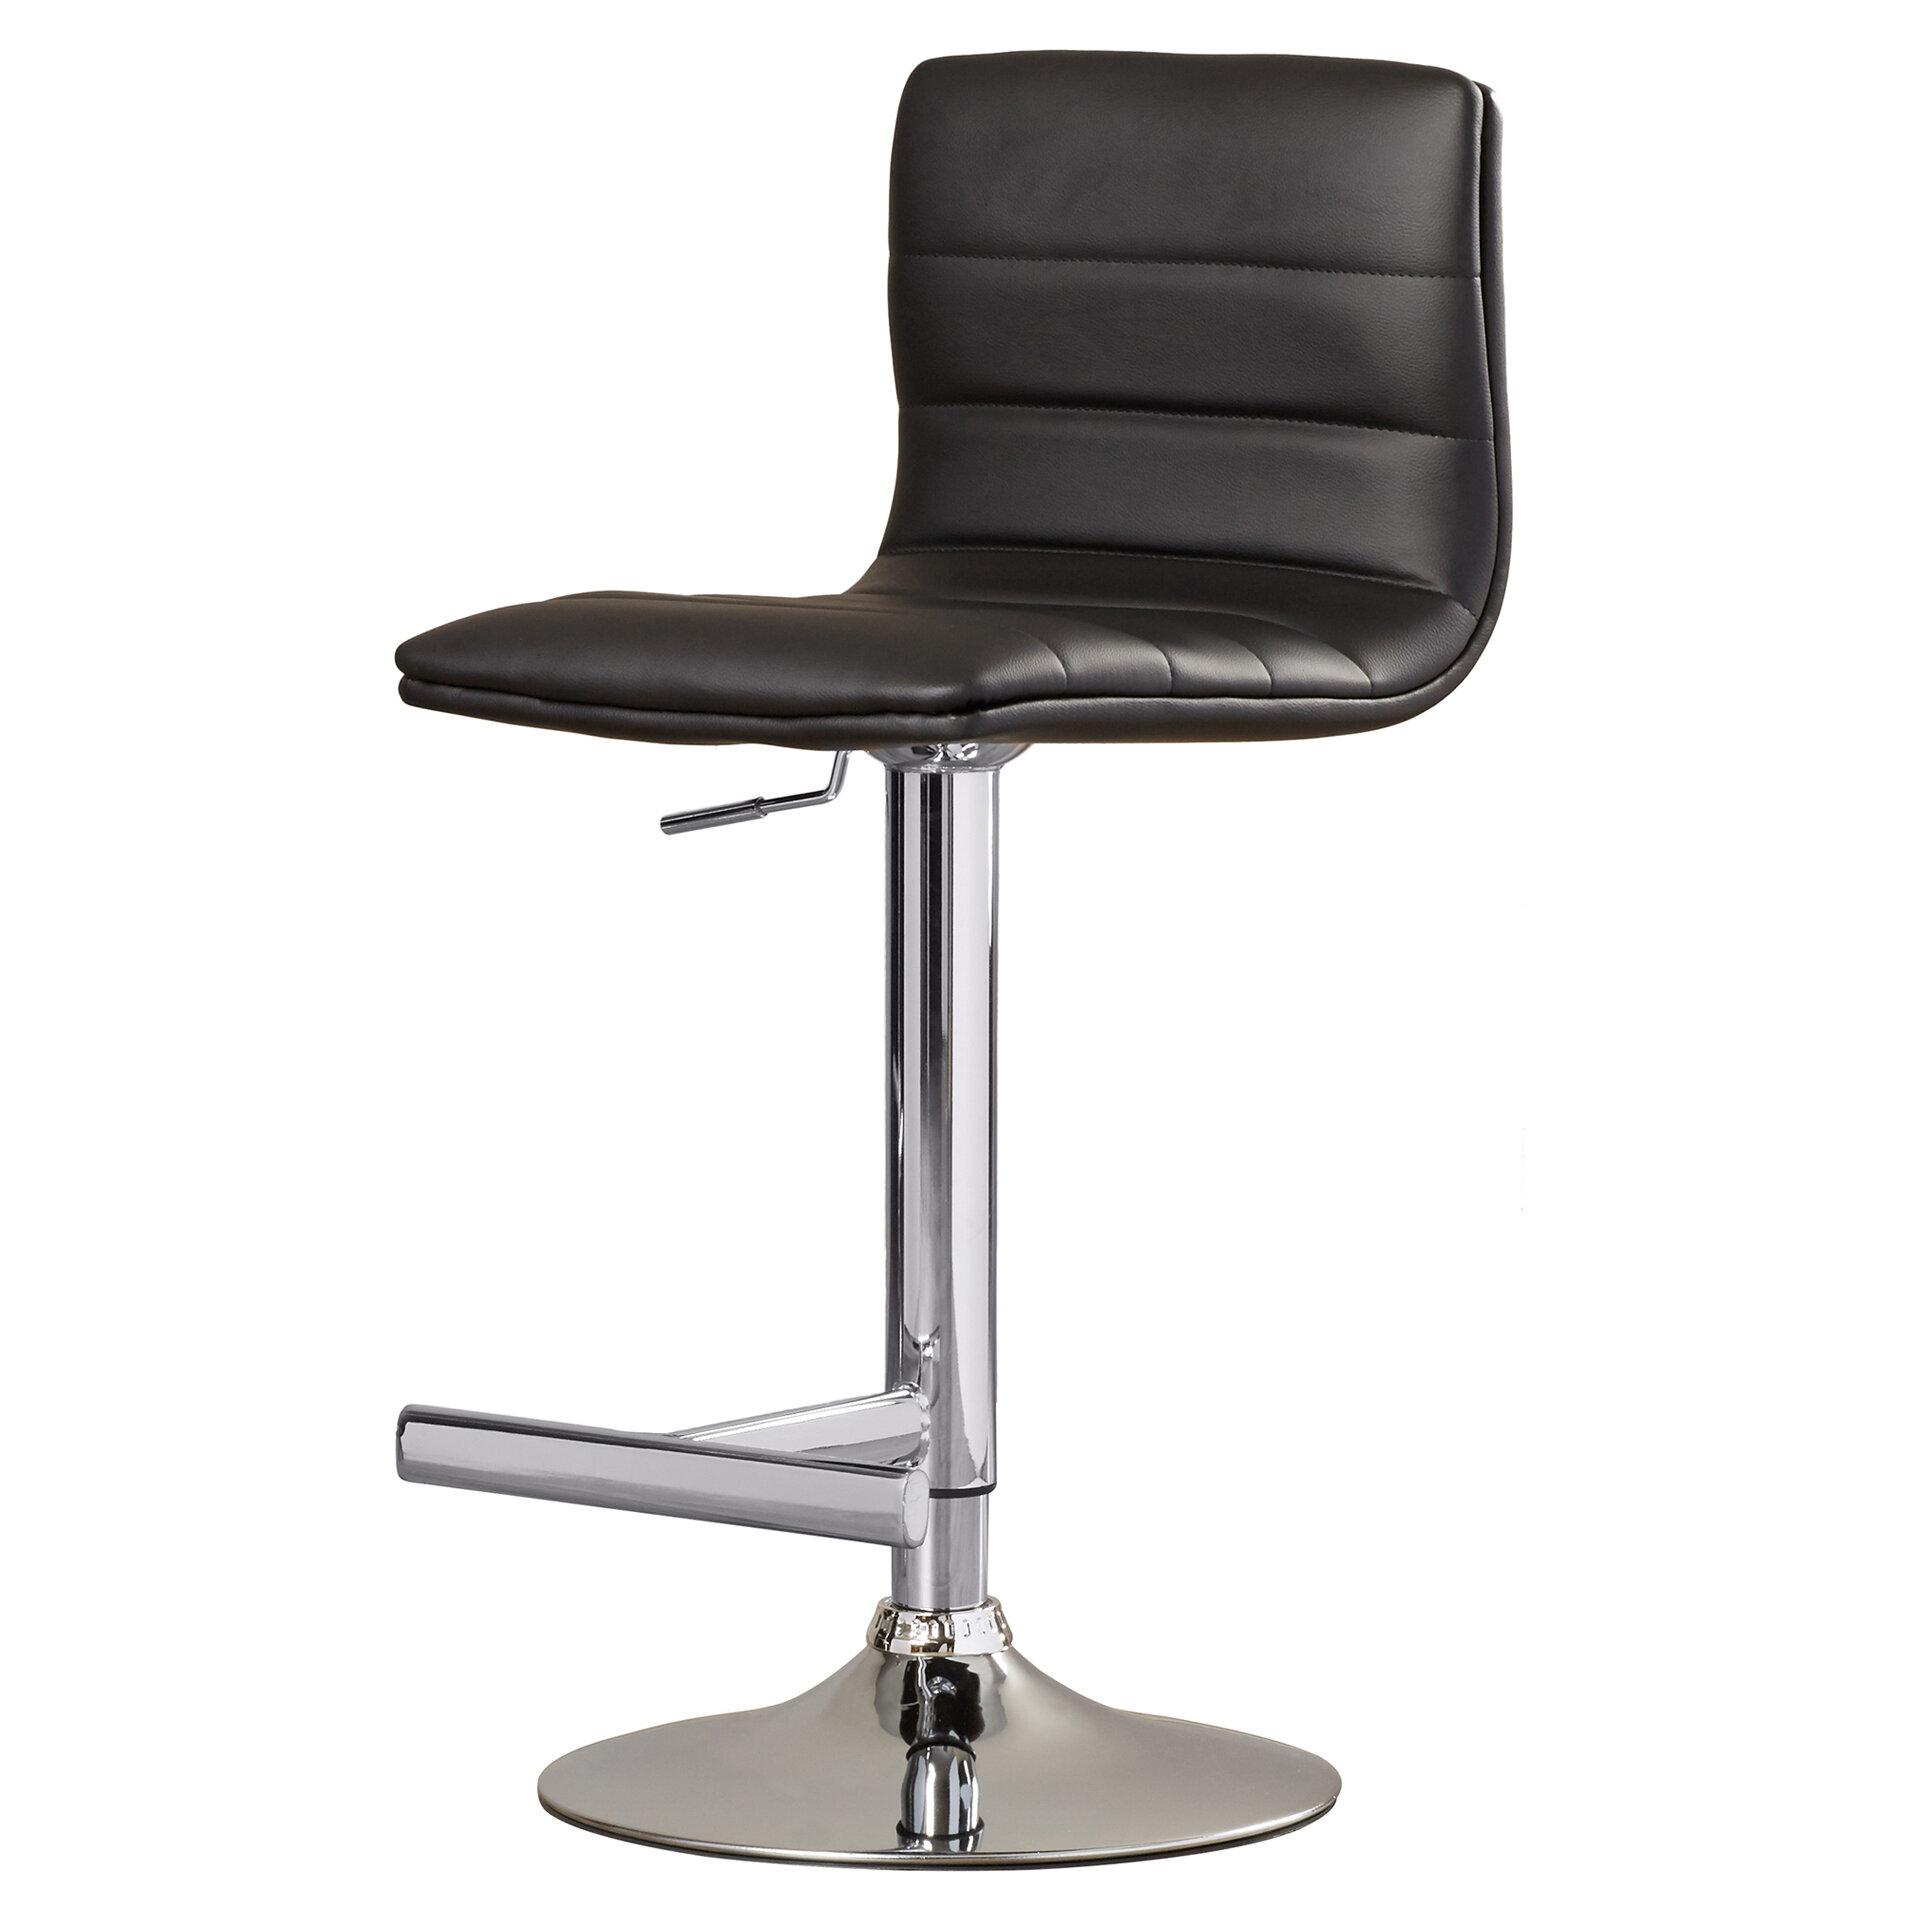 Miraculous Urban Unity Motivo Adjustable Height Swivel Bar Stool Ncnpc Chair Design For Home Ncnpcorg